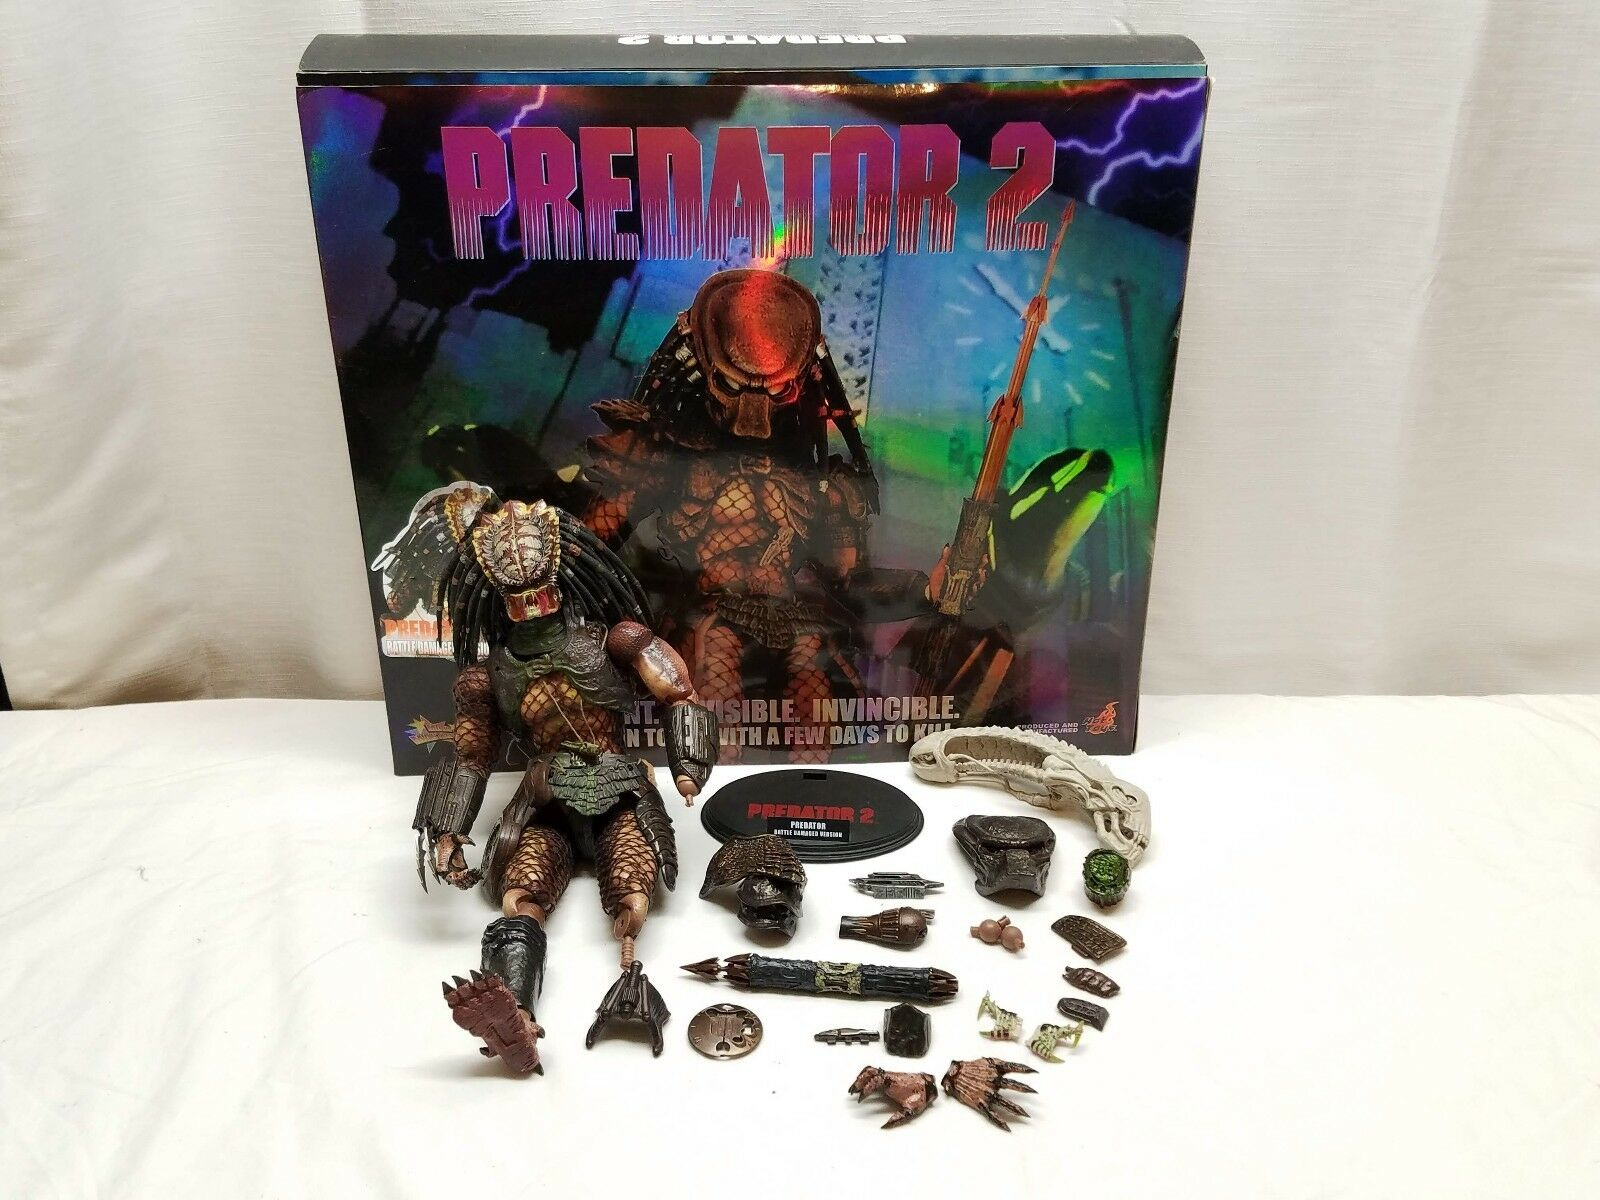 Hot Toys PROTator 2 Battle Damaged City Collectors Edition 1/6 Action Figure Box